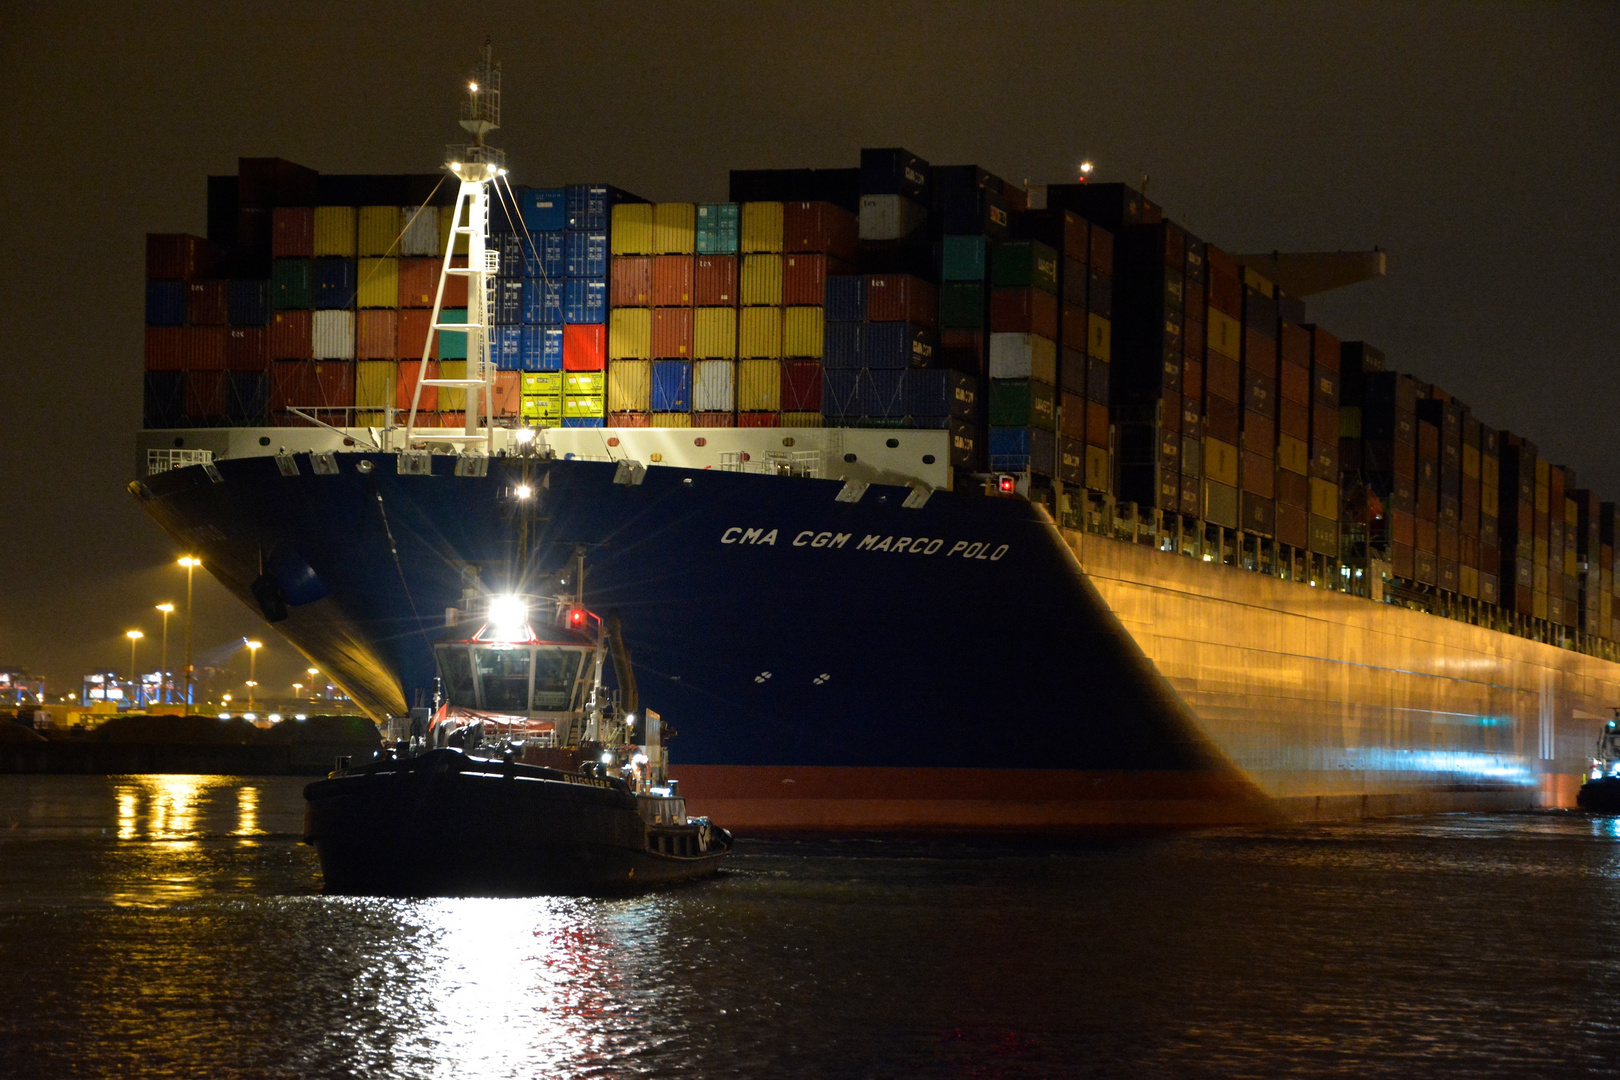 CMA CGM Marco Polo in Hamburg